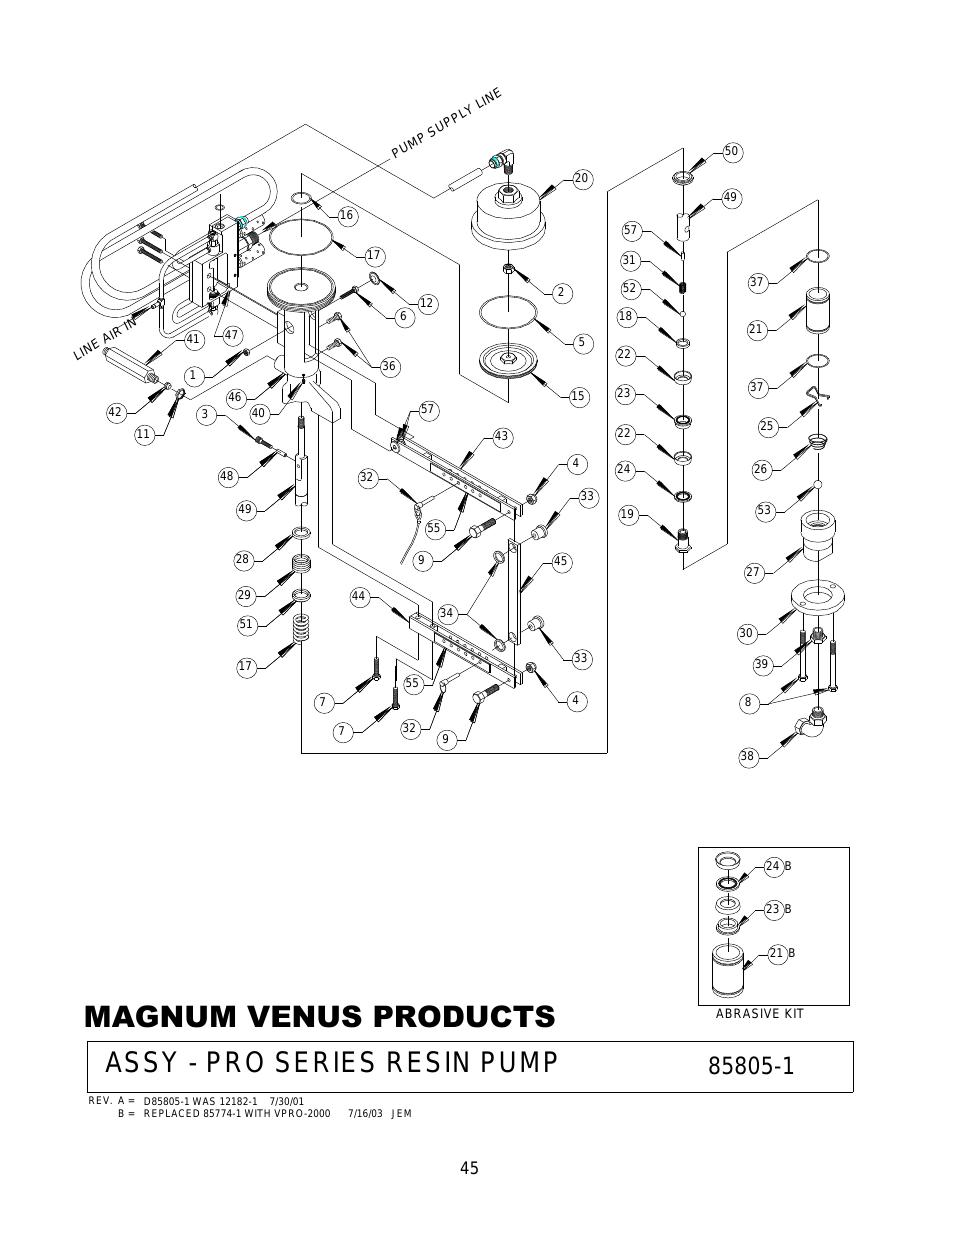 954x1235 Magnum Venus Products, Assy